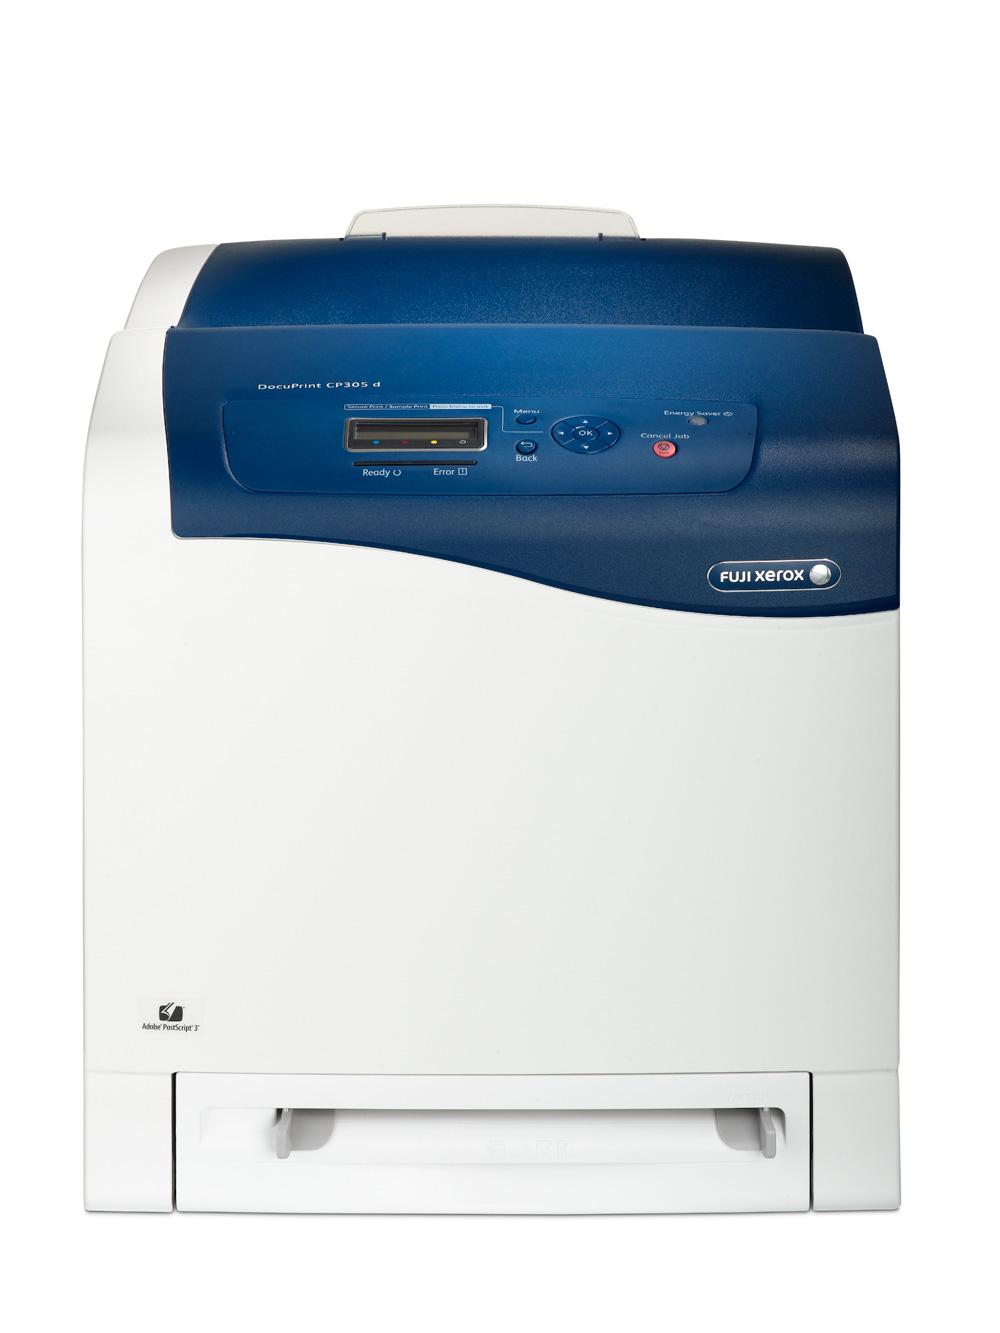 Fuji Xerox DocuPrint CP305d Colour Laser Printer